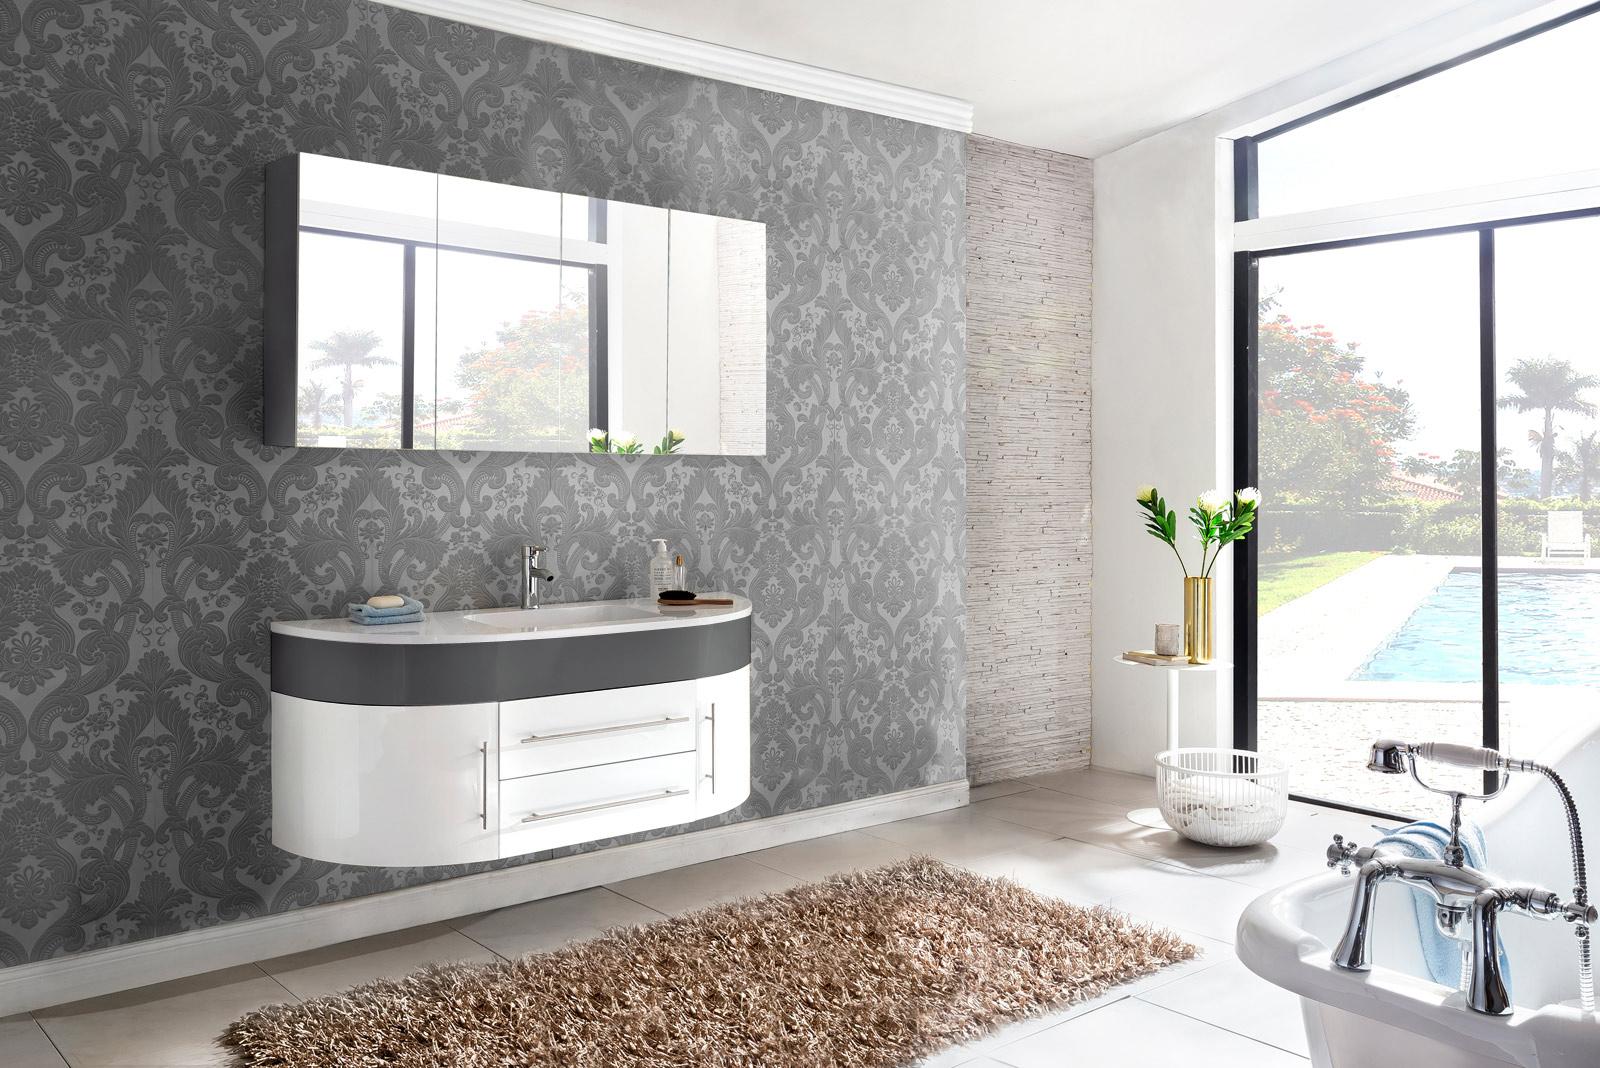 sam badm bel set 2tlg waschbecken 140 cm wei grau hochglanz dublin demn chst. Black Bedroom Furniture Sets. Home Design Ideas